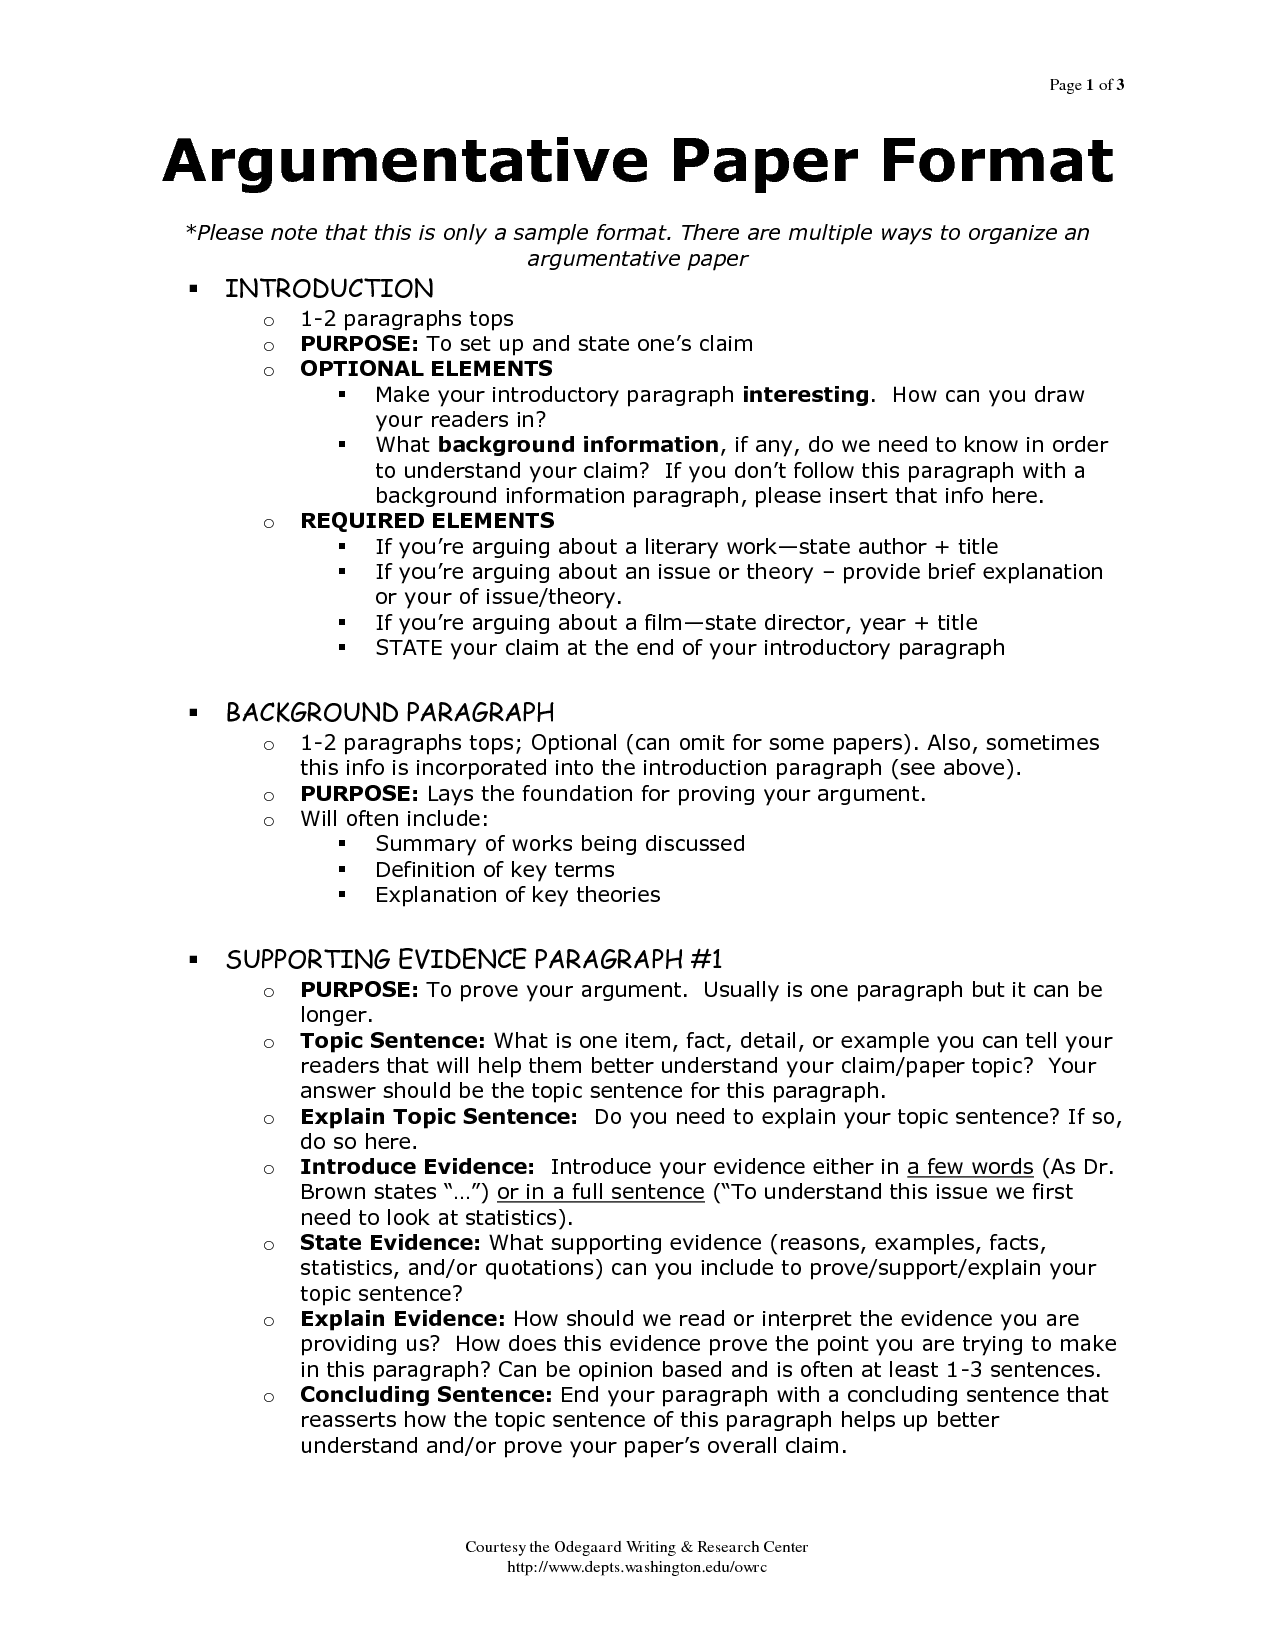 Argumentative Essay Writing Worksheets